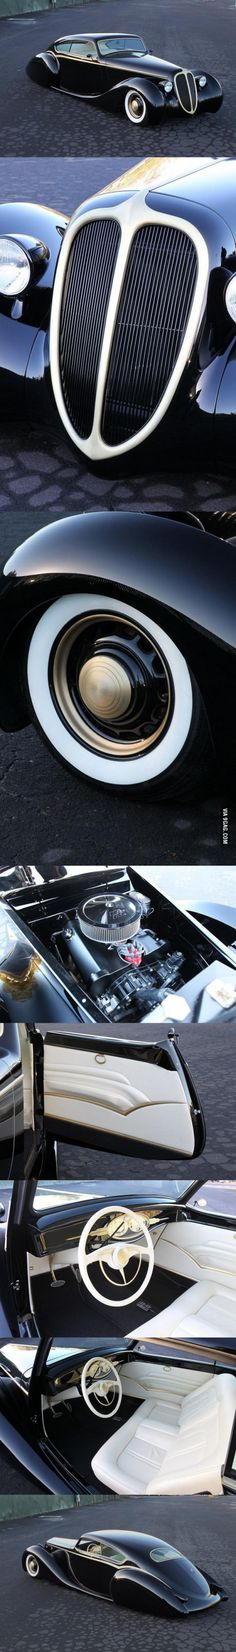 "Metallica's James Hetfield's custom built car, the ""Black Pearl"""